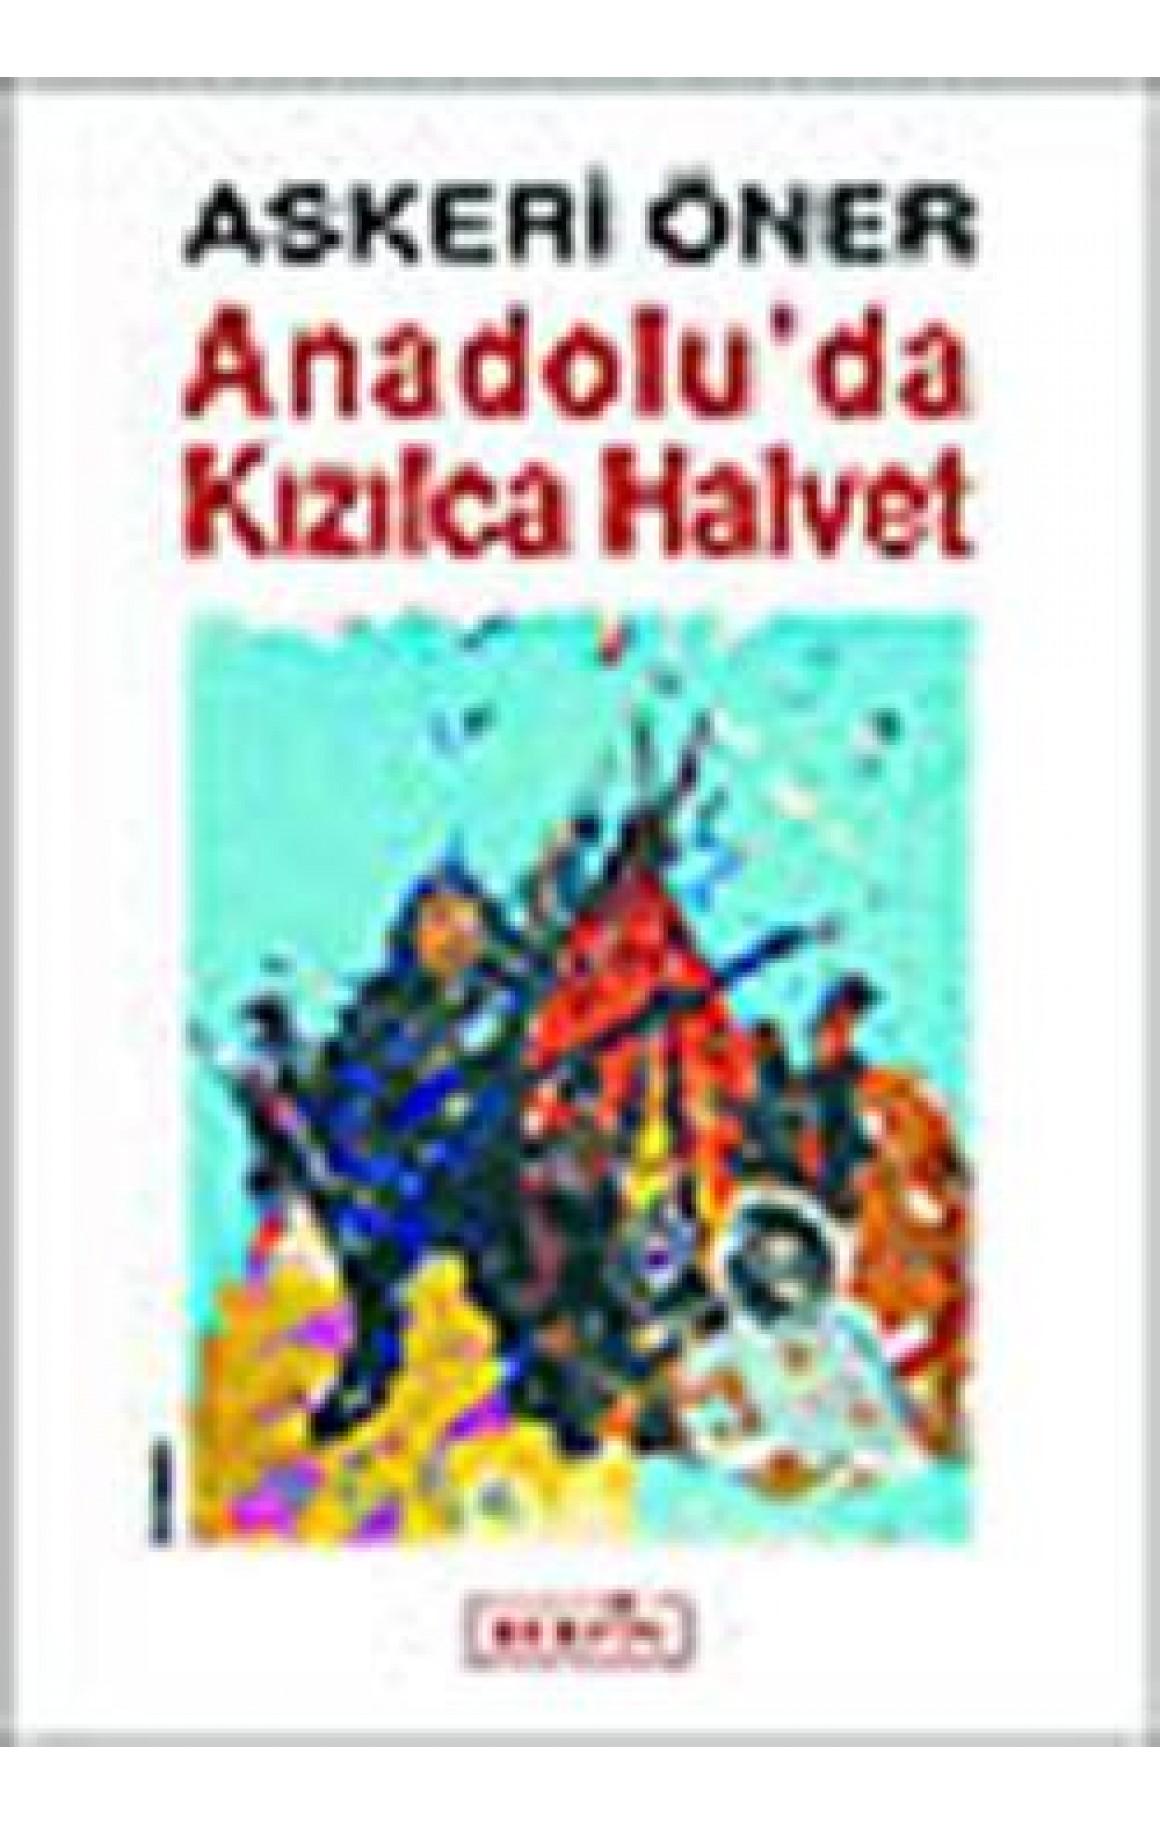 Anadoluda Kizilca Halvet